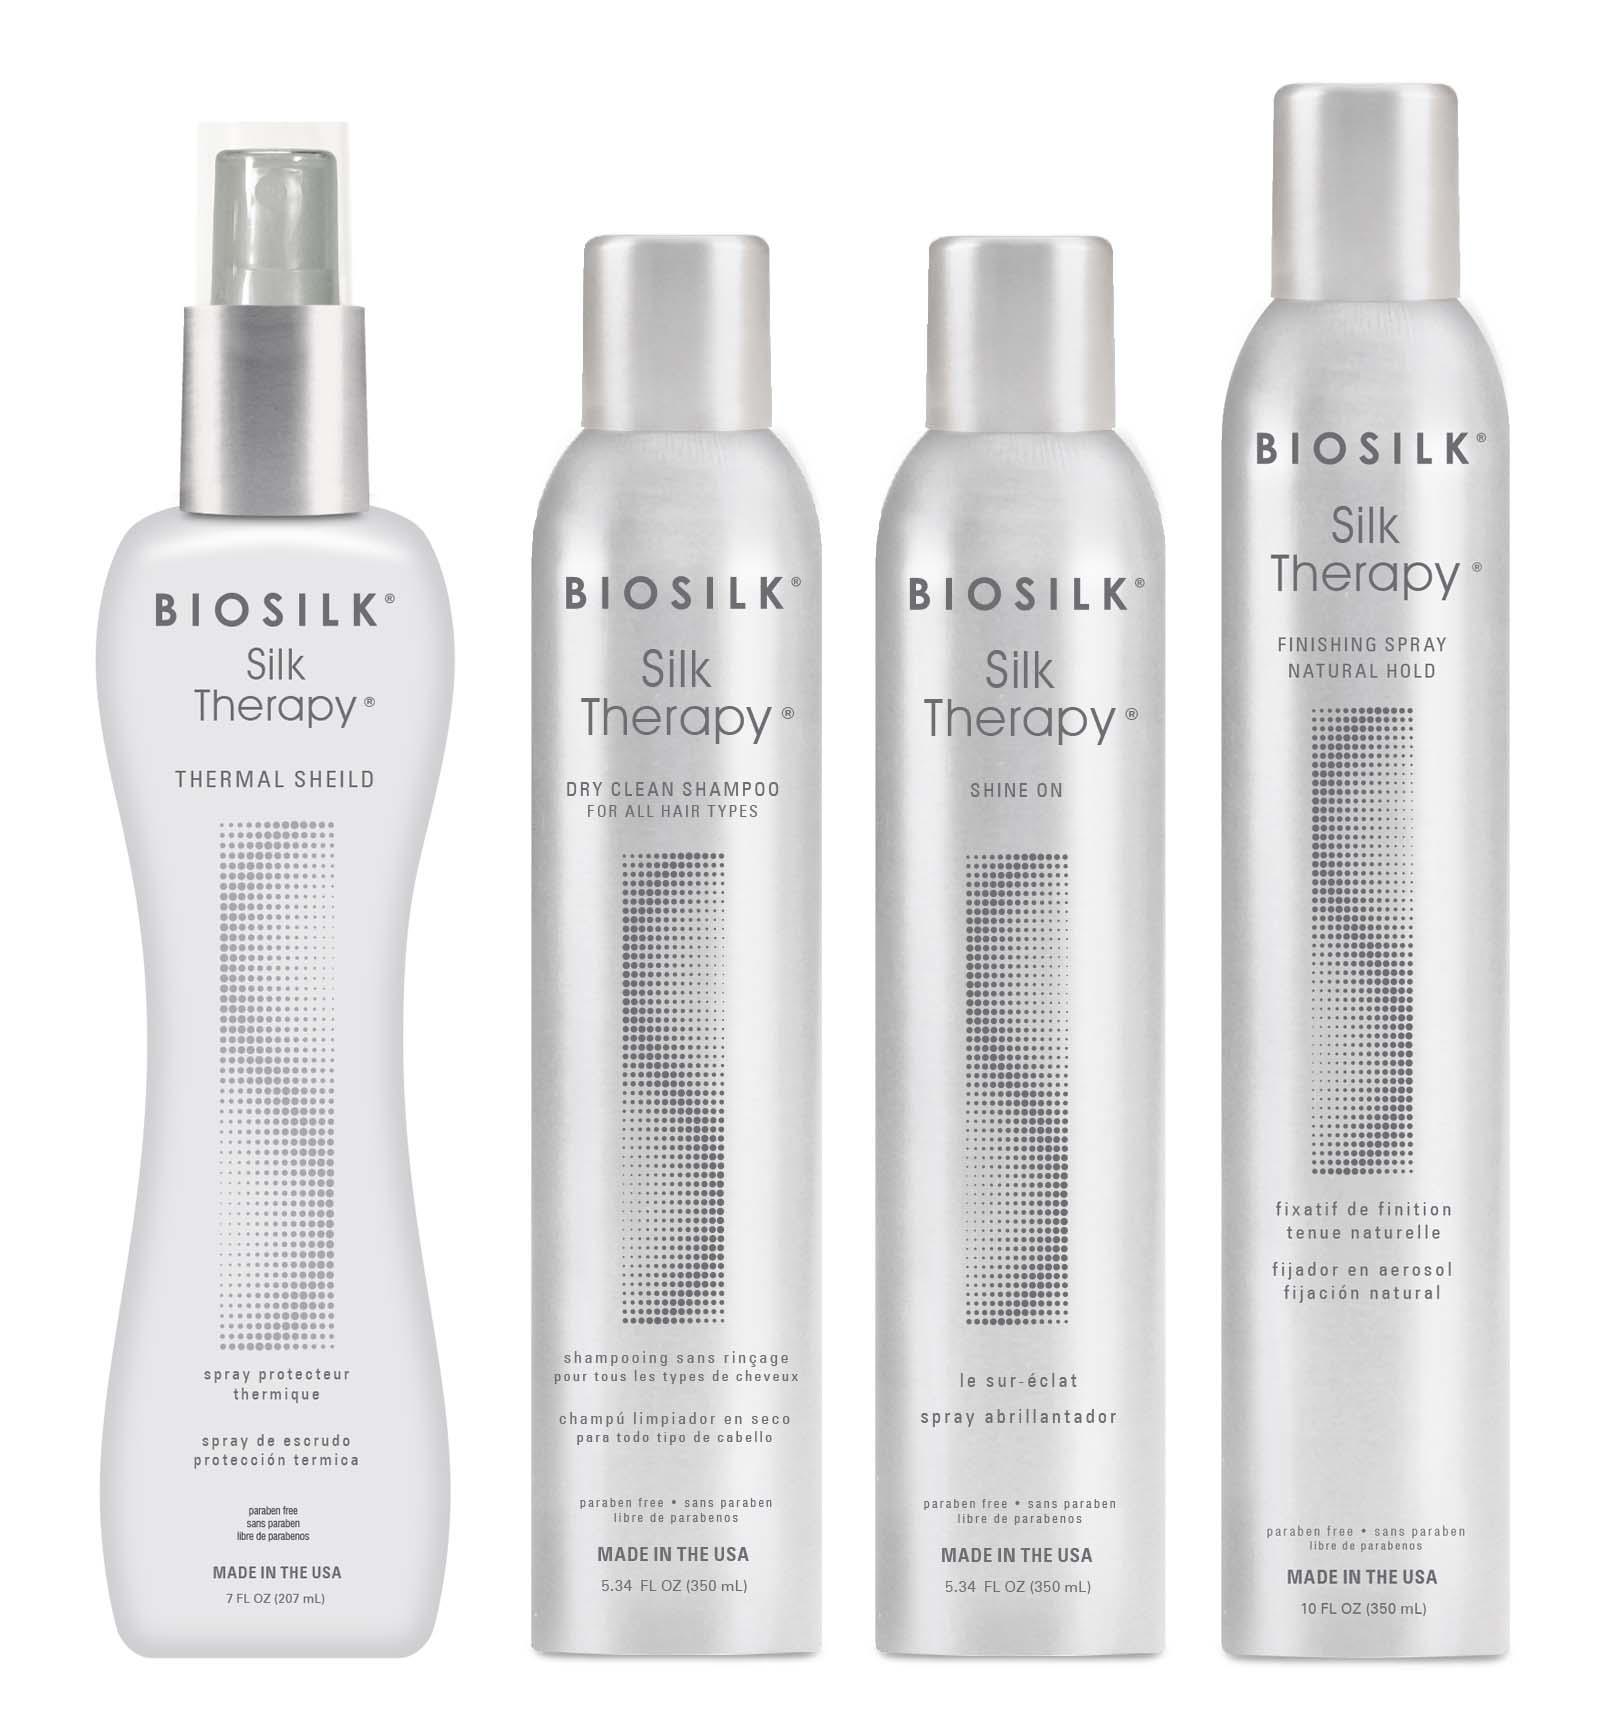 BioSilk Products.jpg